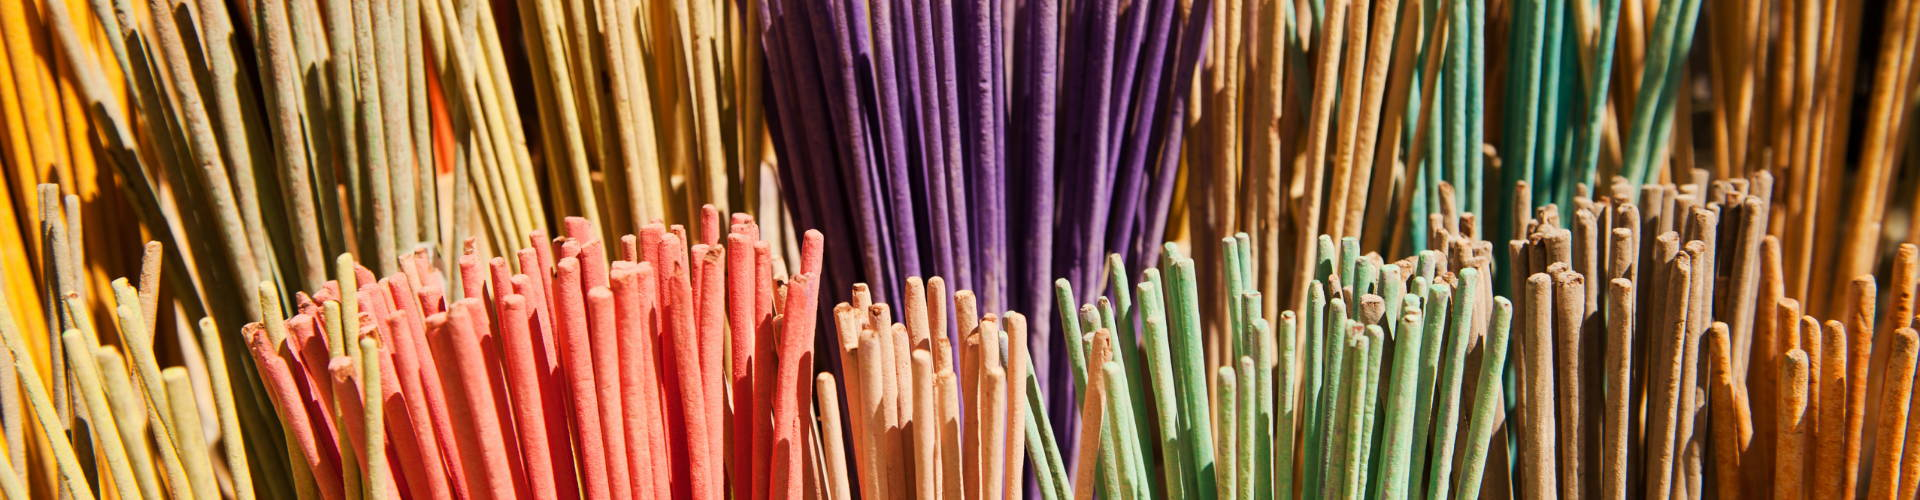 incense sticks selection